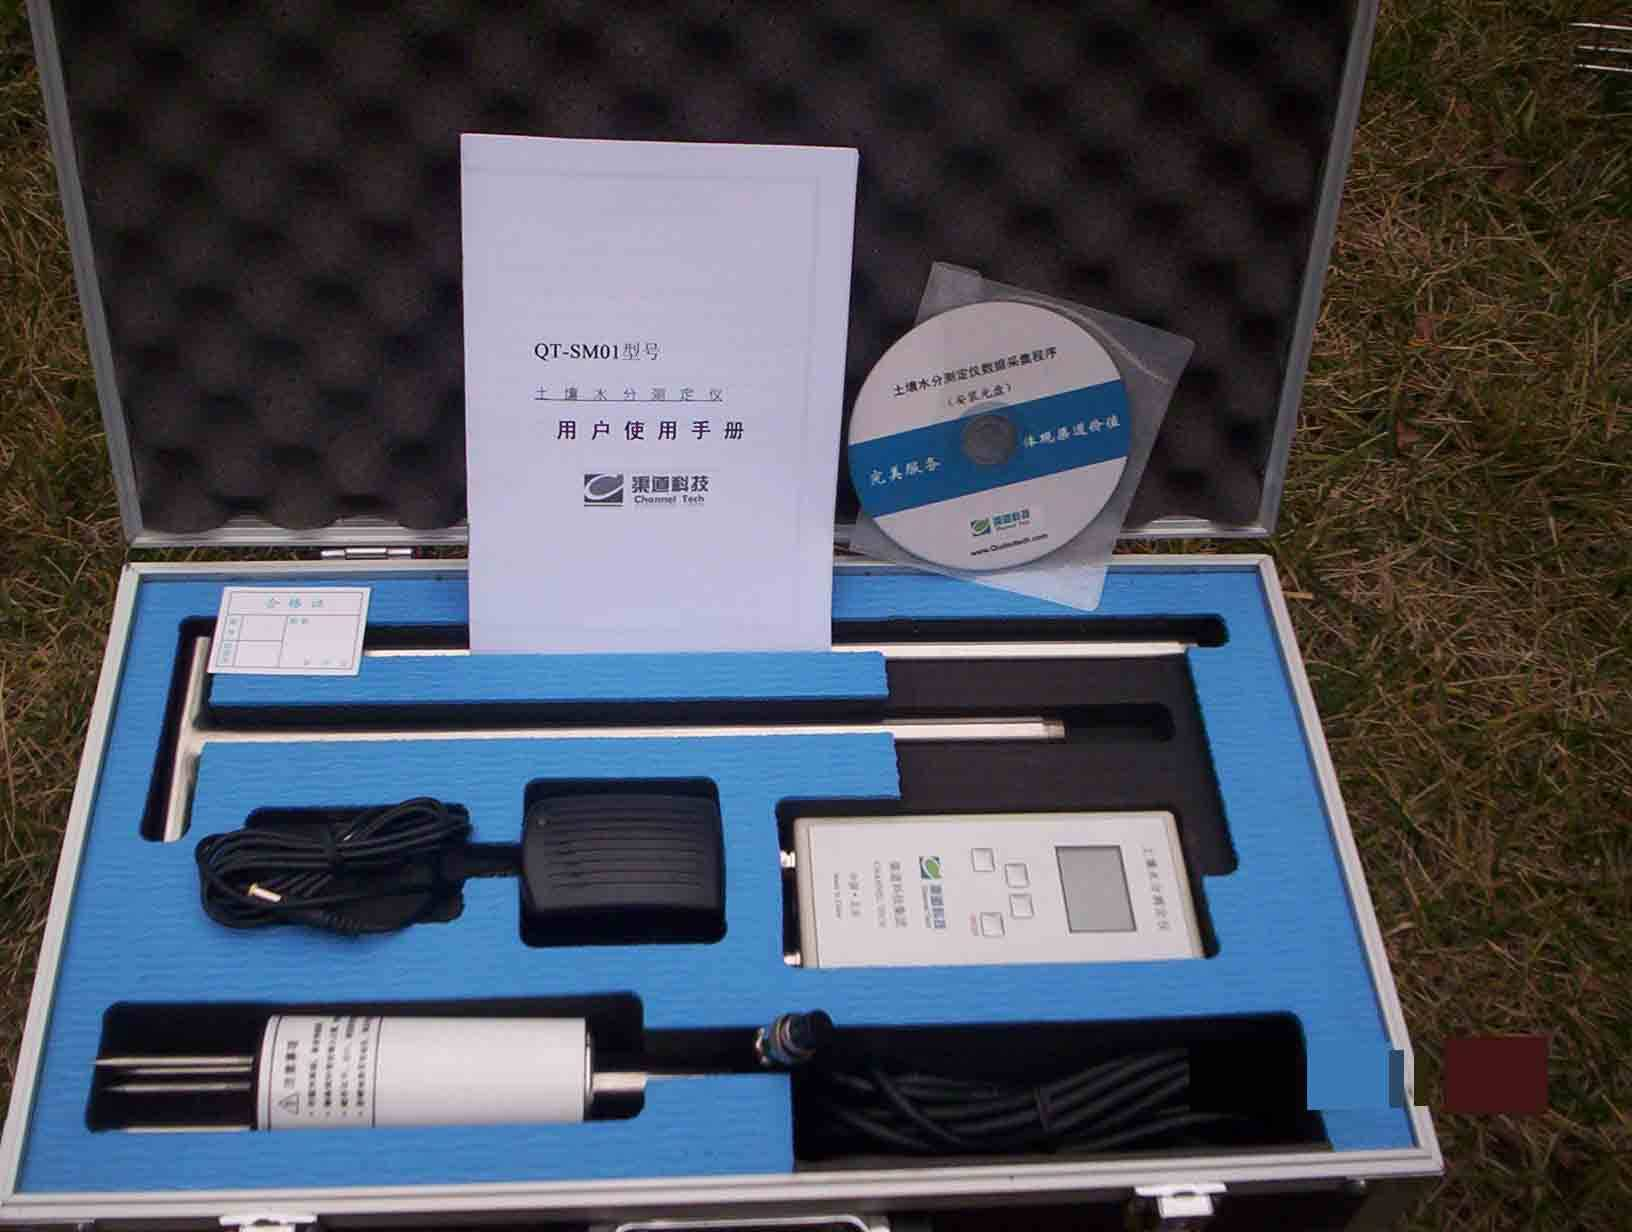 QT-SM01 Soil Moisture Meter